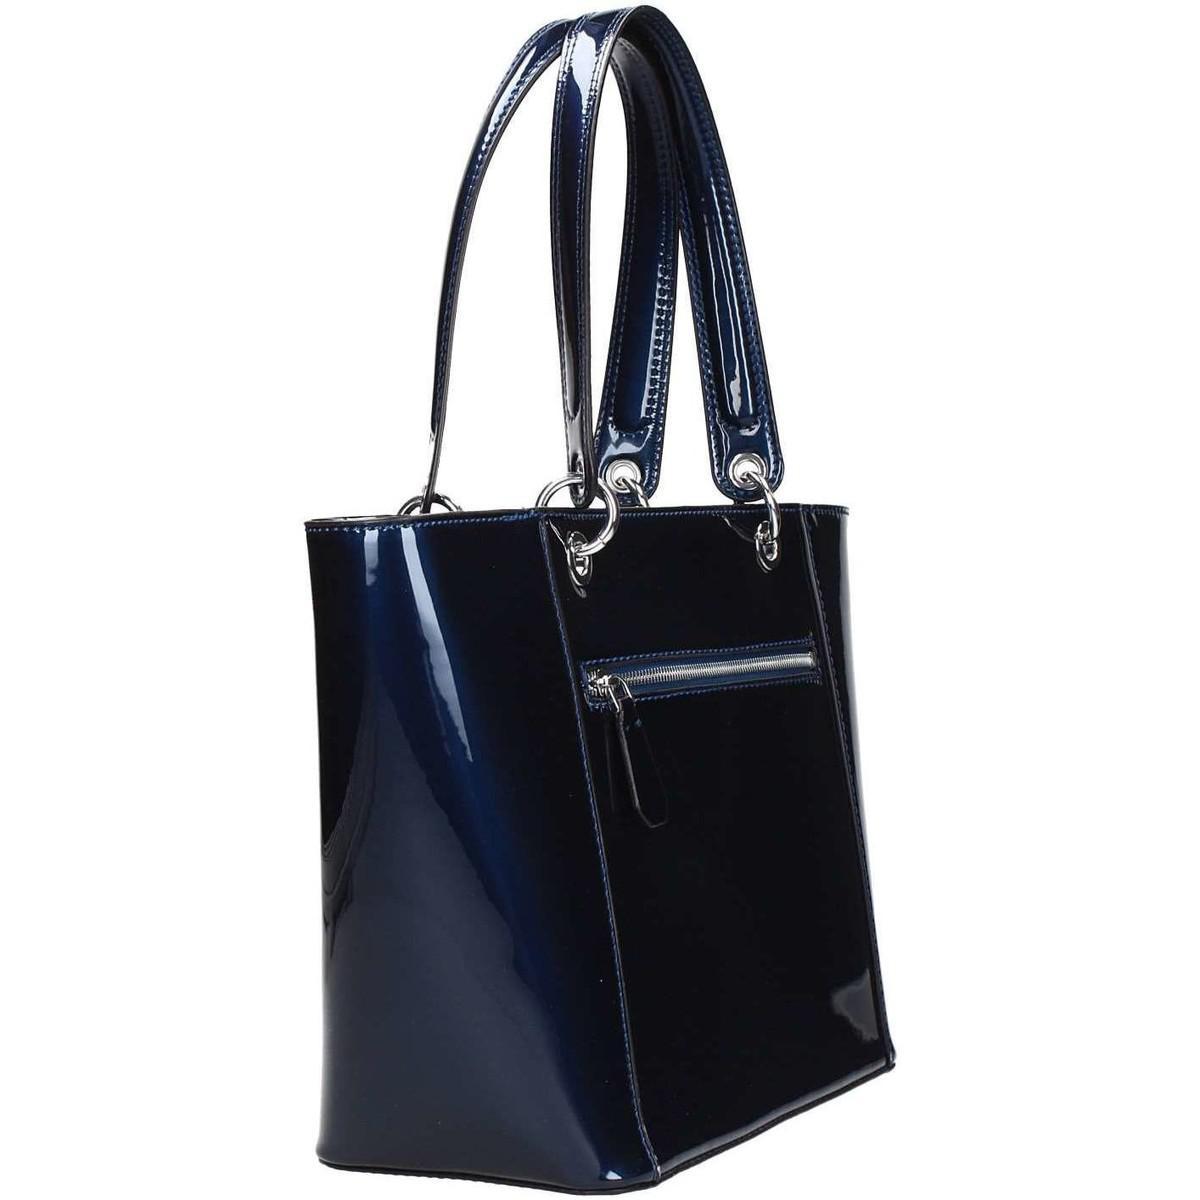 94362f73d21a Guess Hwpt66 91230 Shopping Bag Women s Shopper Bag In Blue in Blue ...